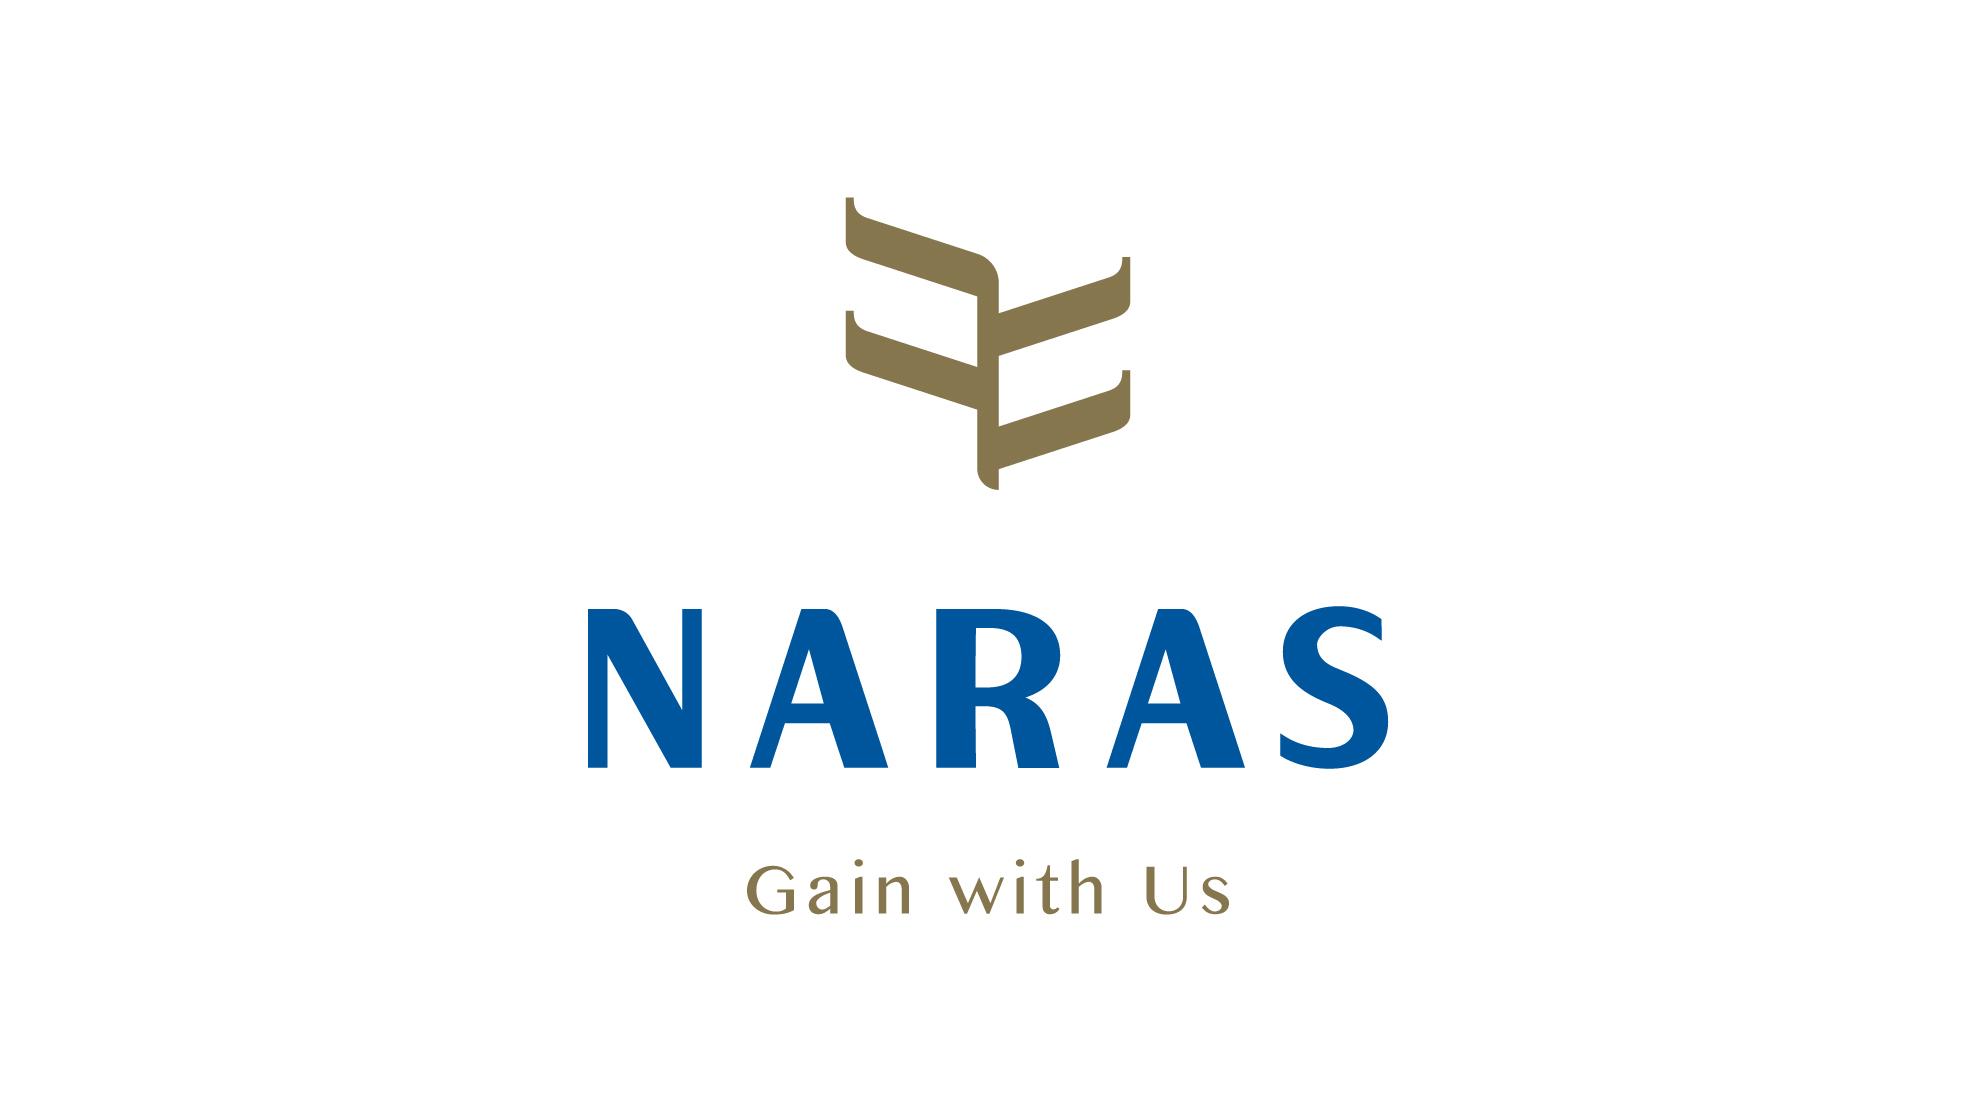 Naras